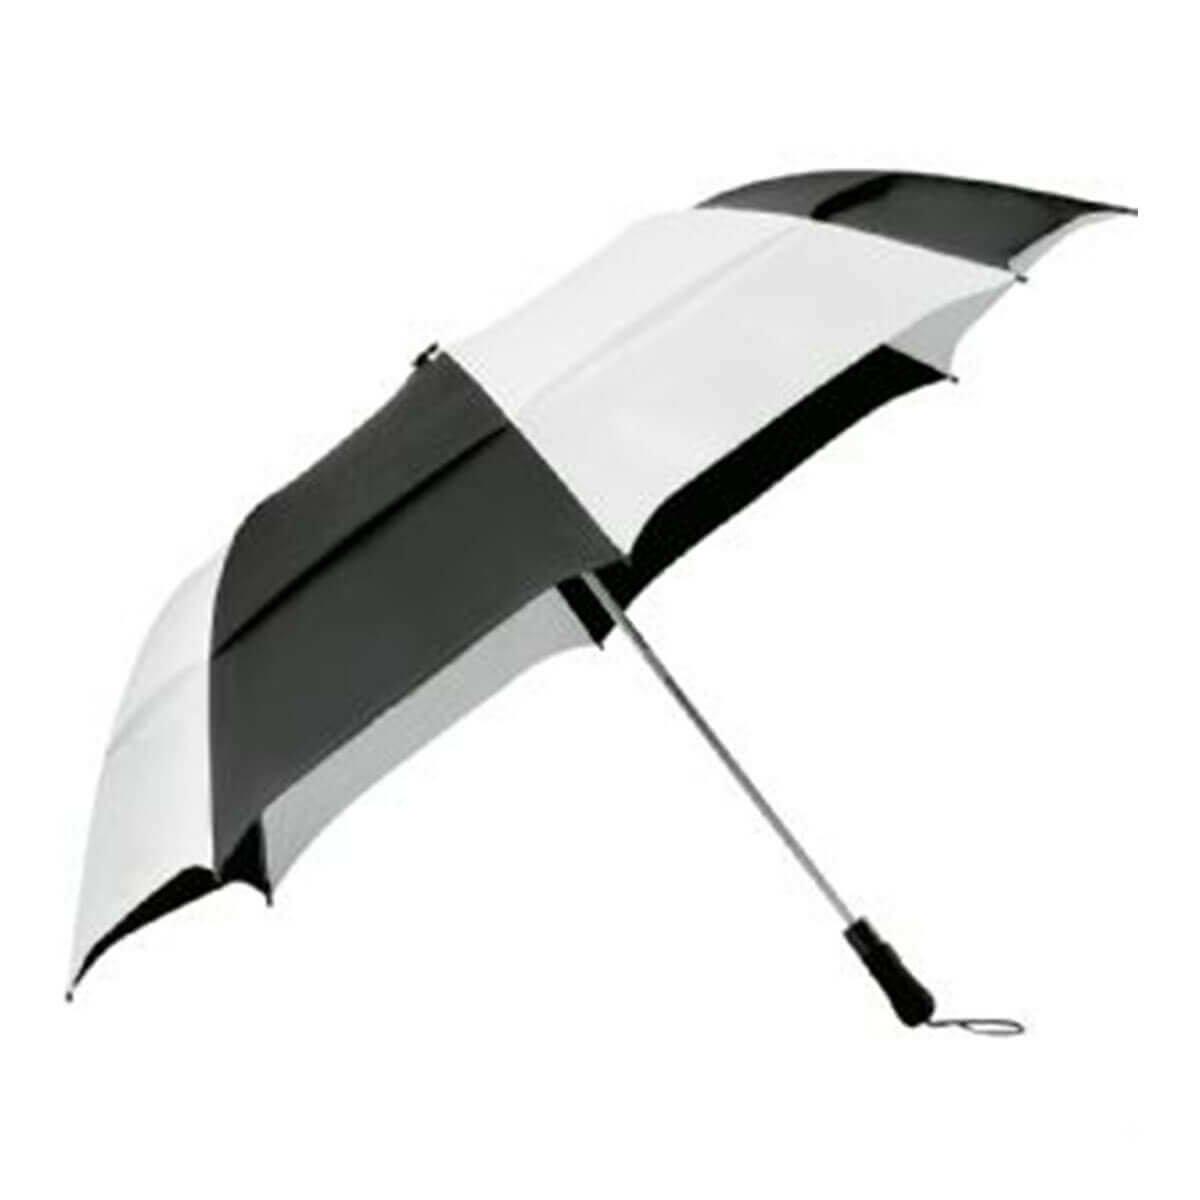 Vented Folding Umbrella-Black & White.